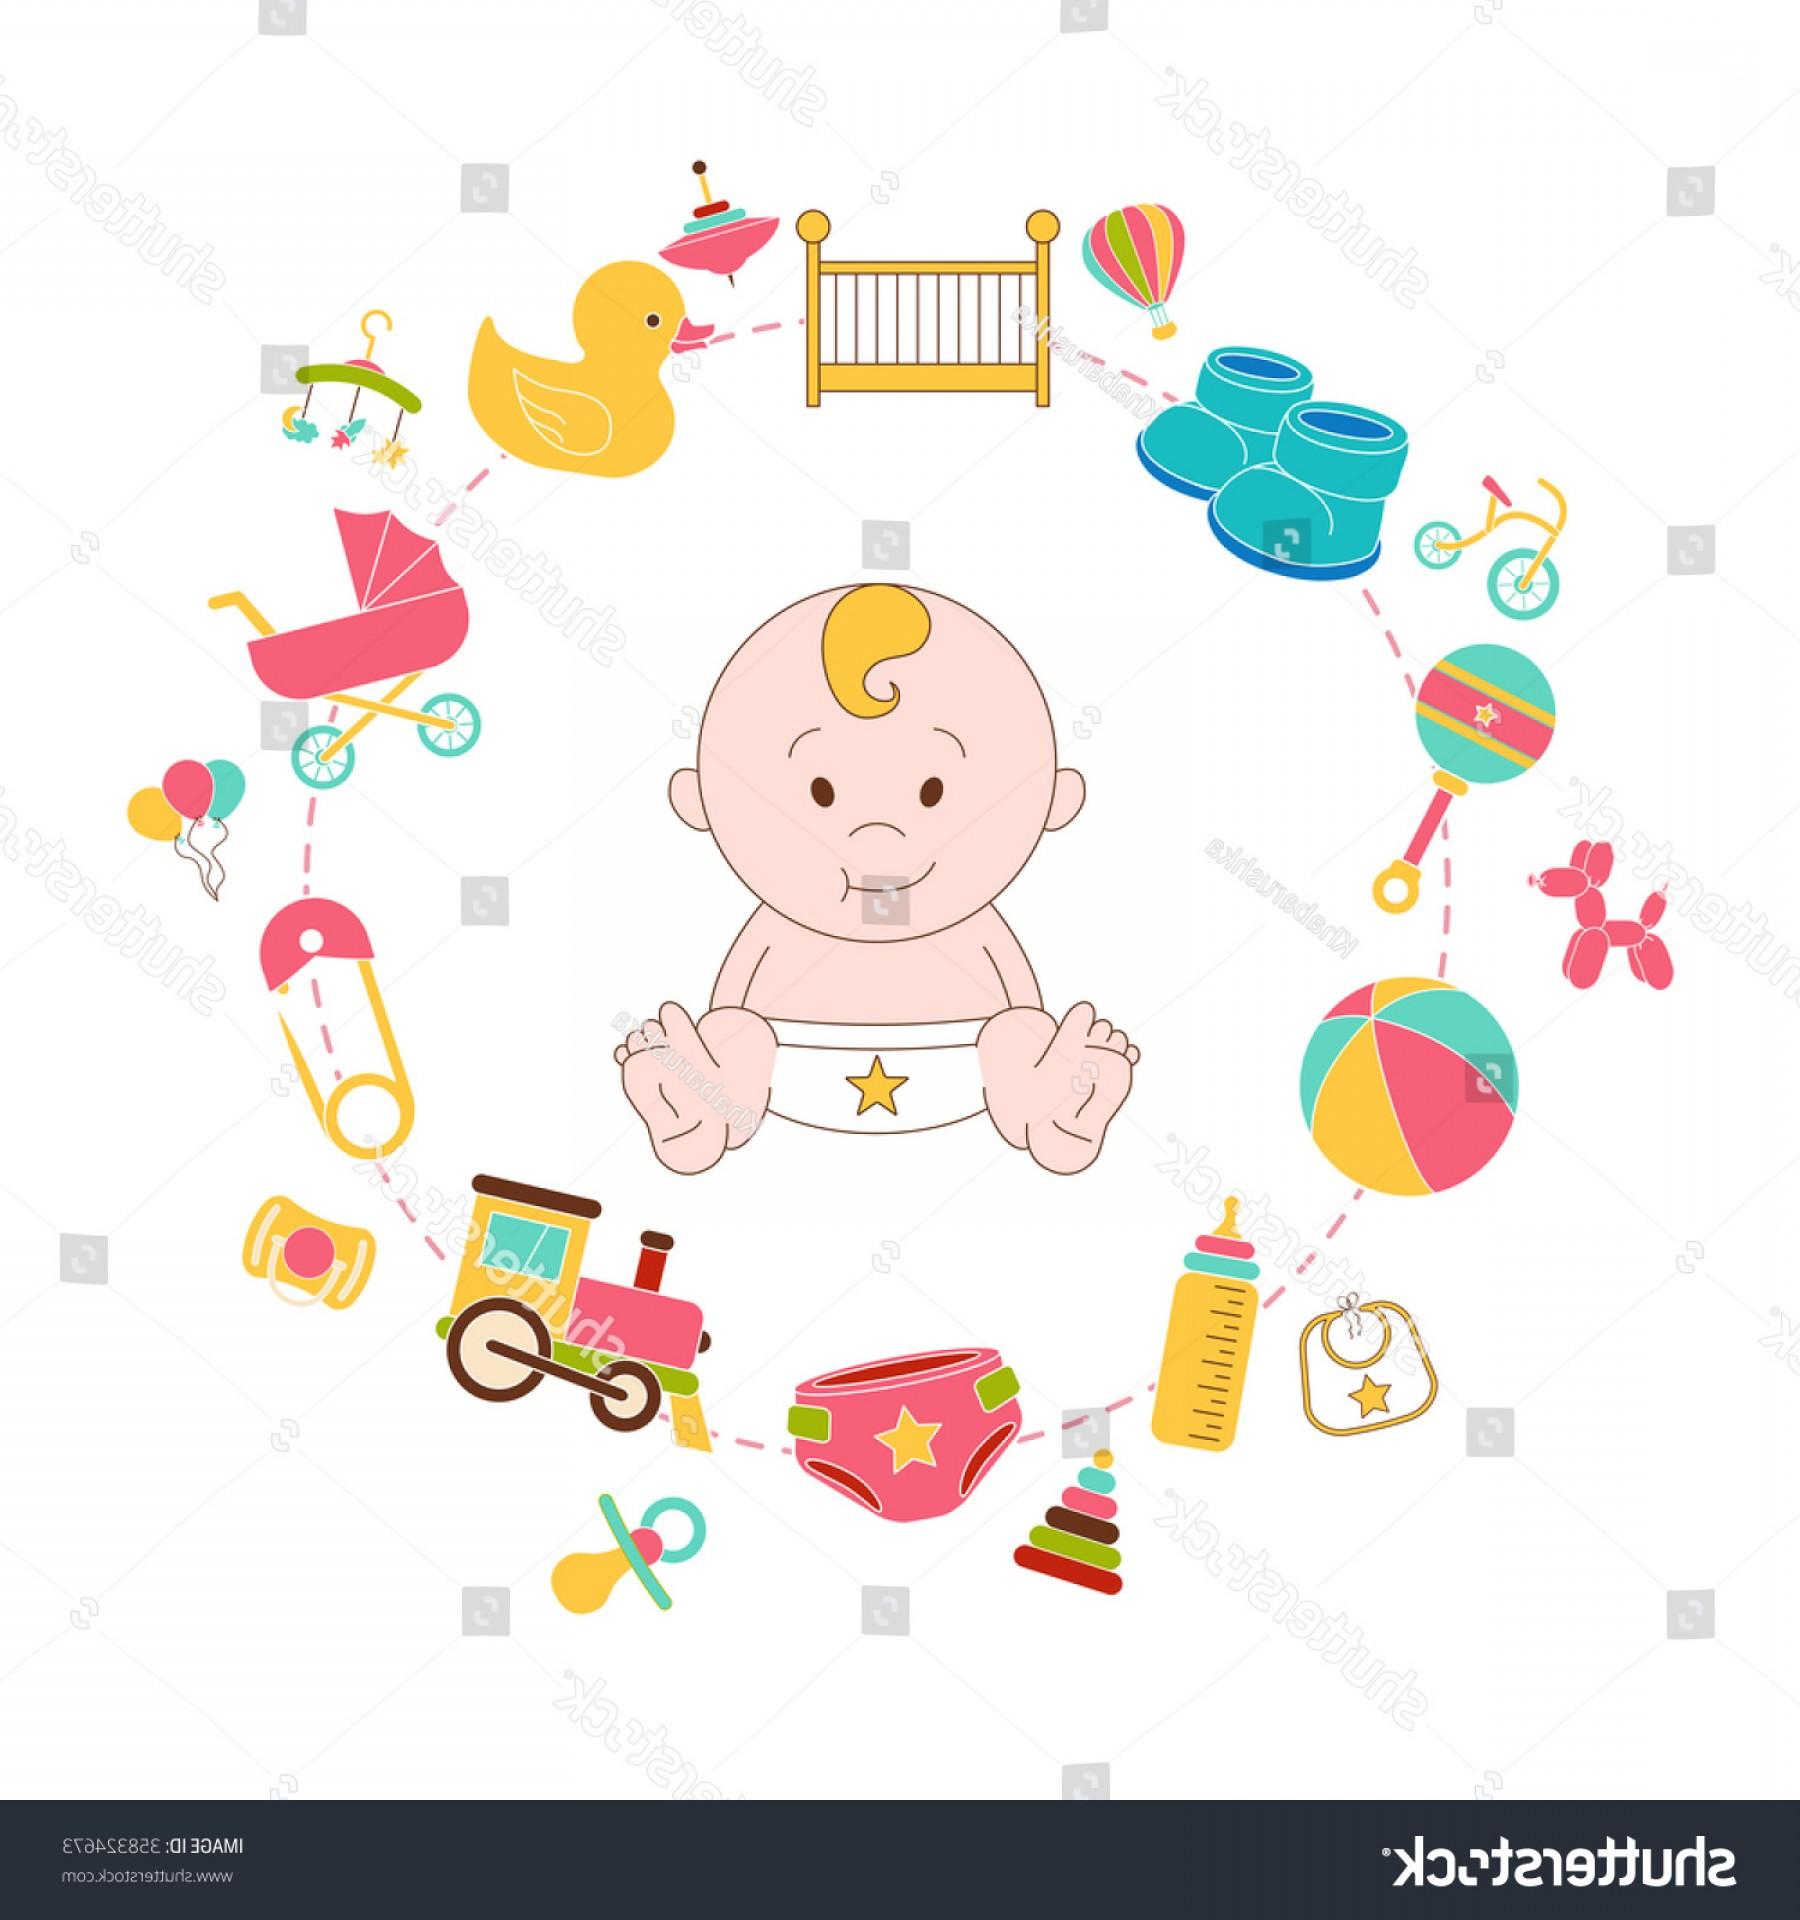 1800x1920 Baby Stuff Doodle Elements Set Babies Arenawp